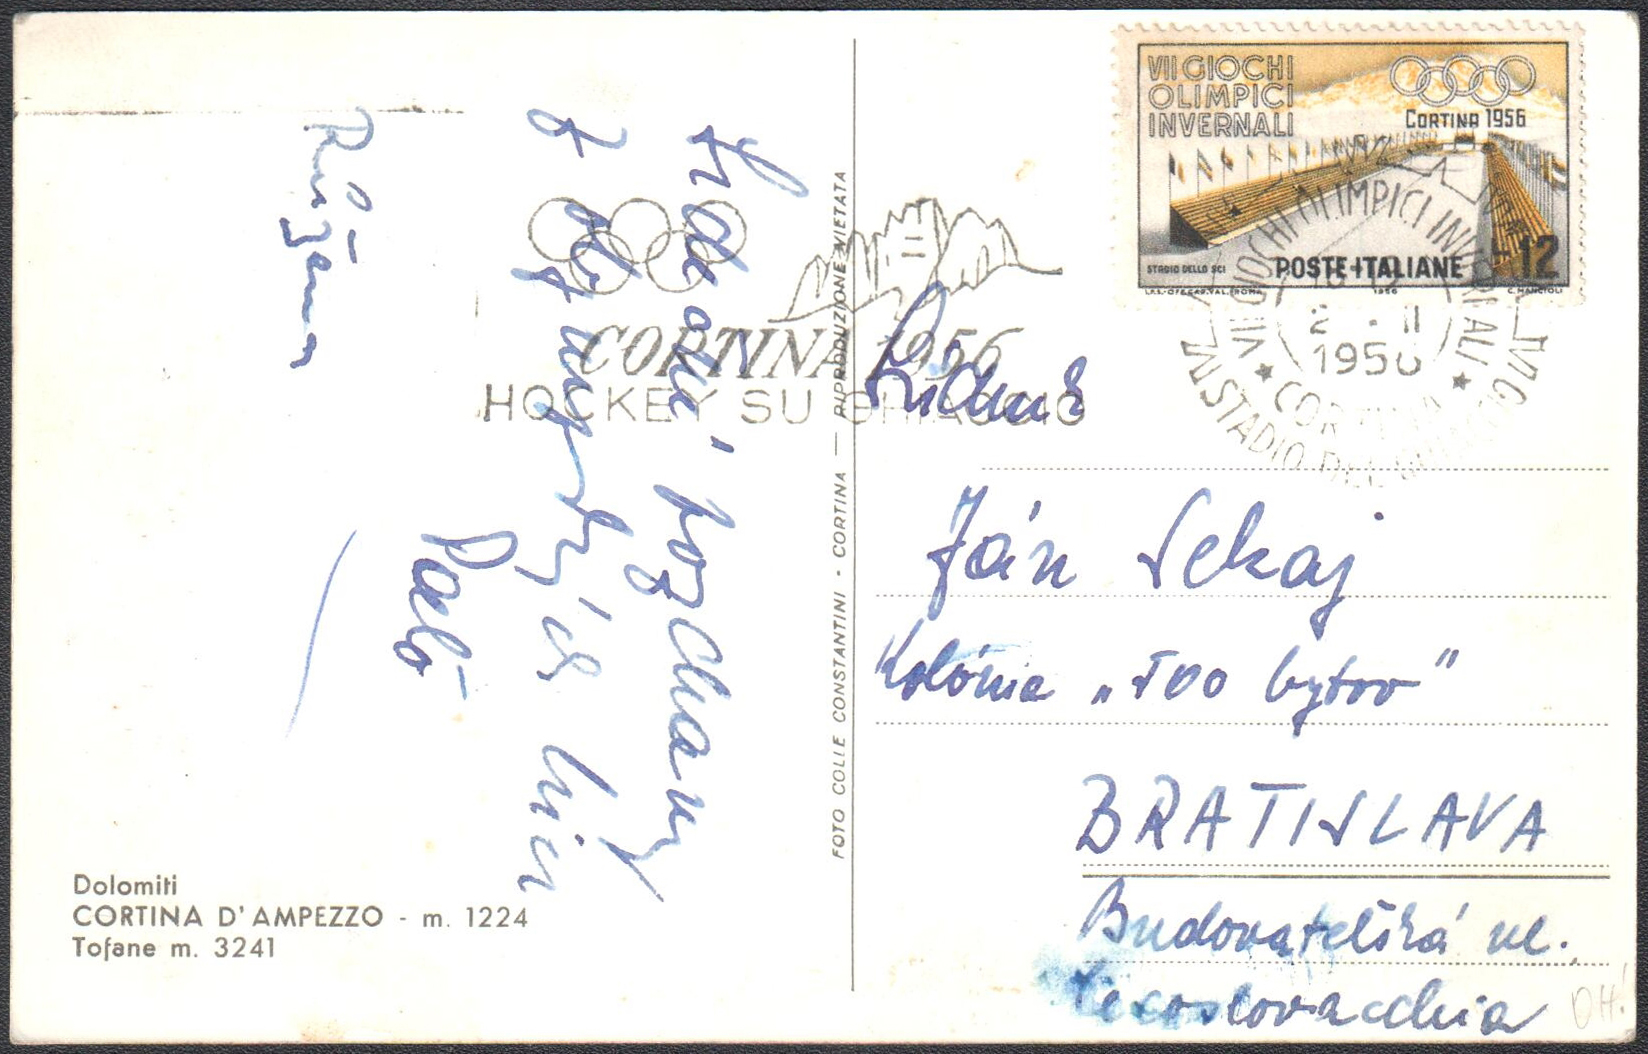 TALIANSKO 1956 - Zimn� olympijsk� hry CORTINA D�AMPEZZO 1956 (�adov� hokej)